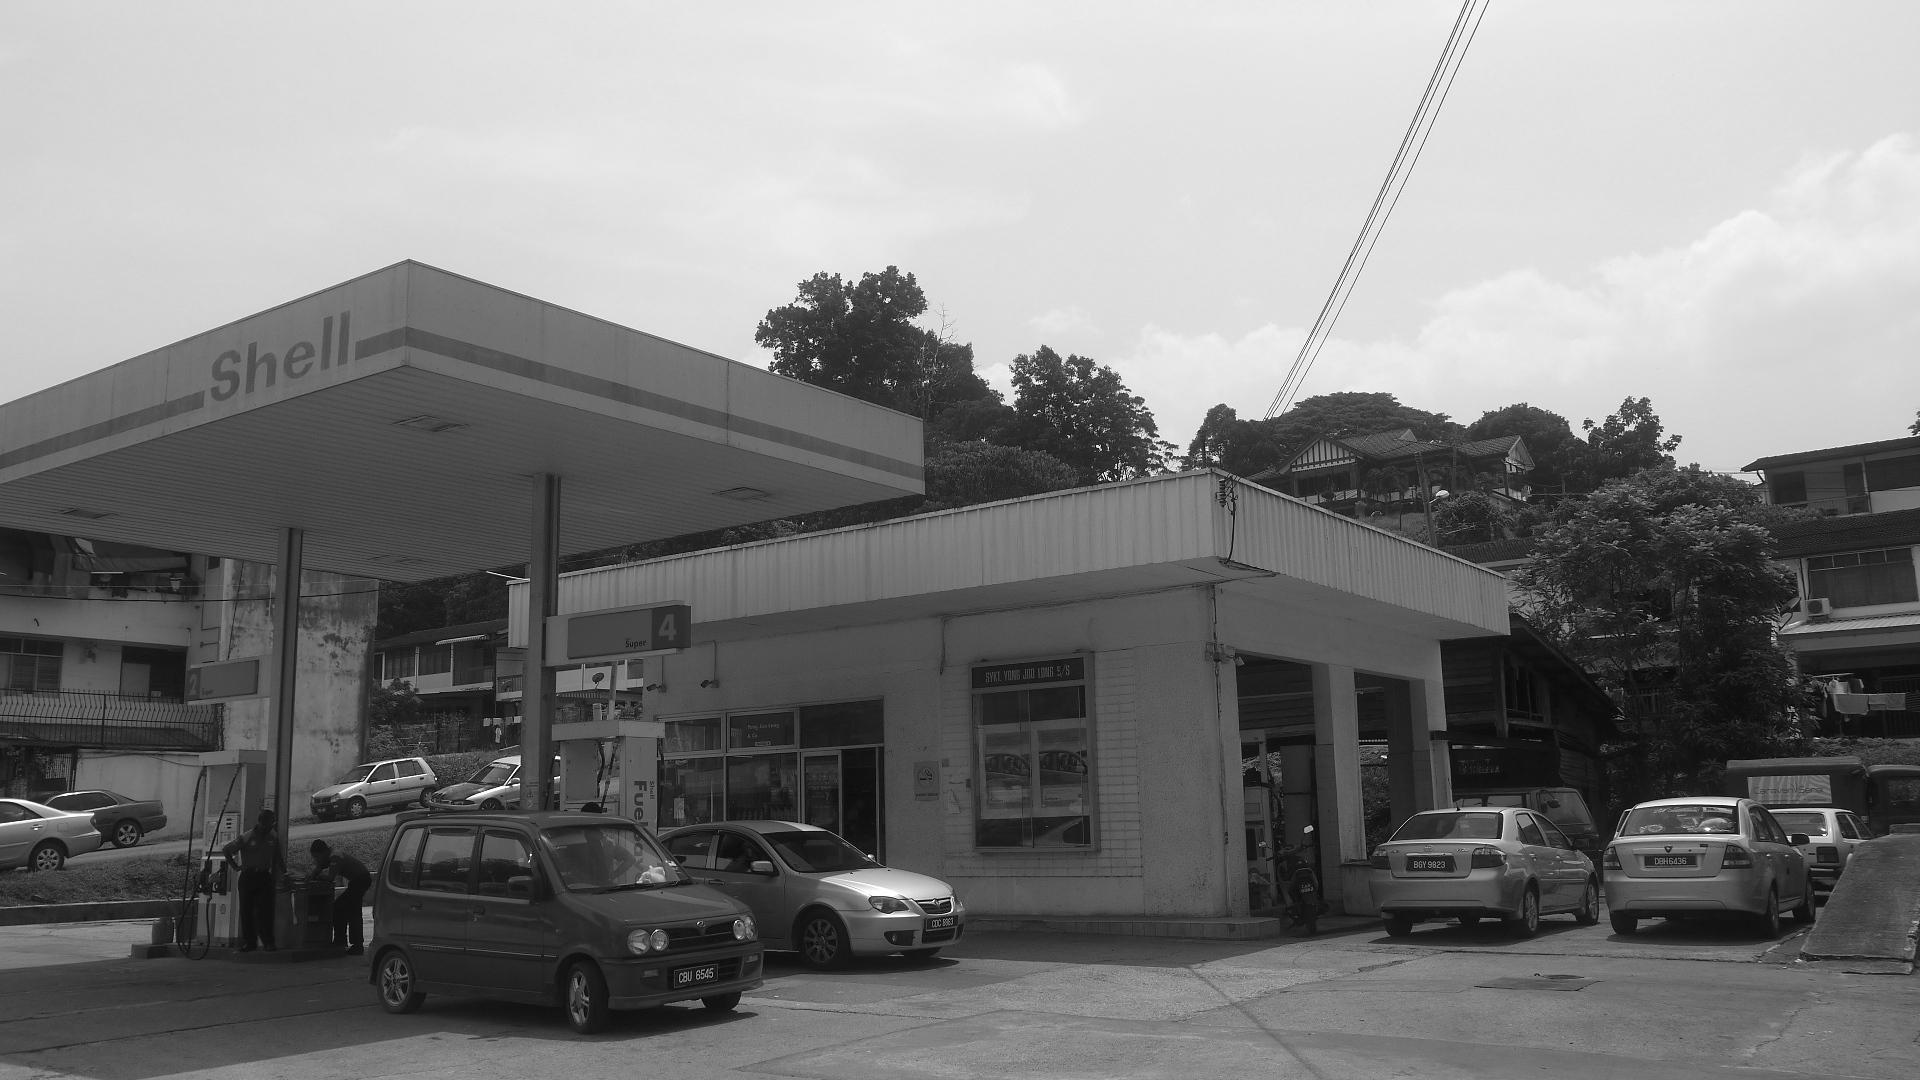 Yong Joo Long Shell Station in 2013